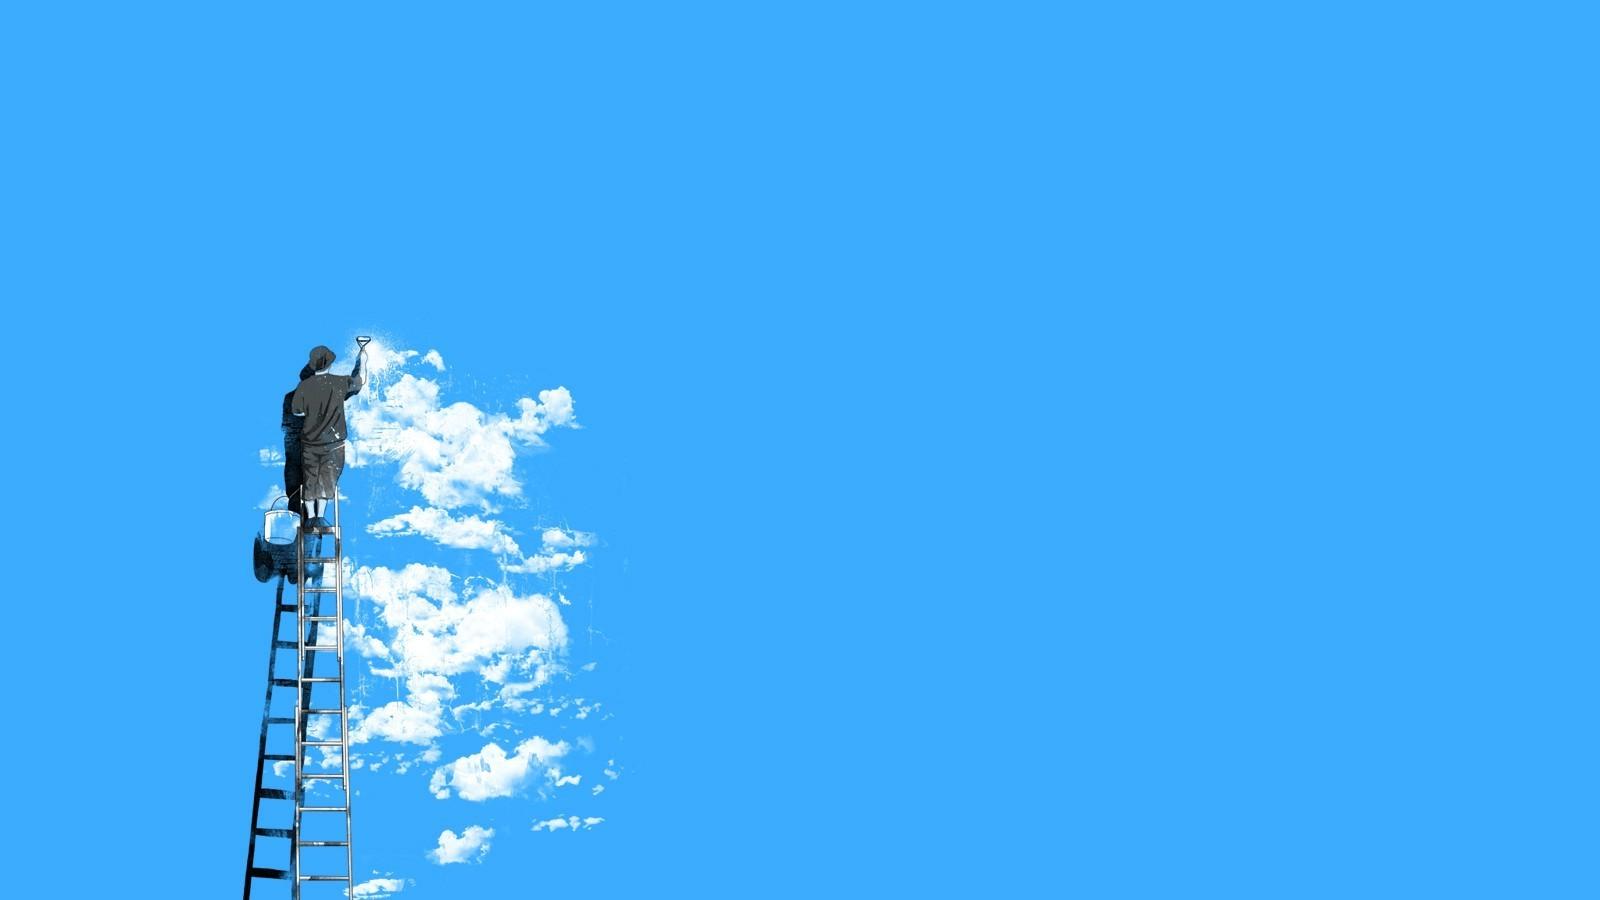 wallpaper : men, street light, minimalism, sky, blue background